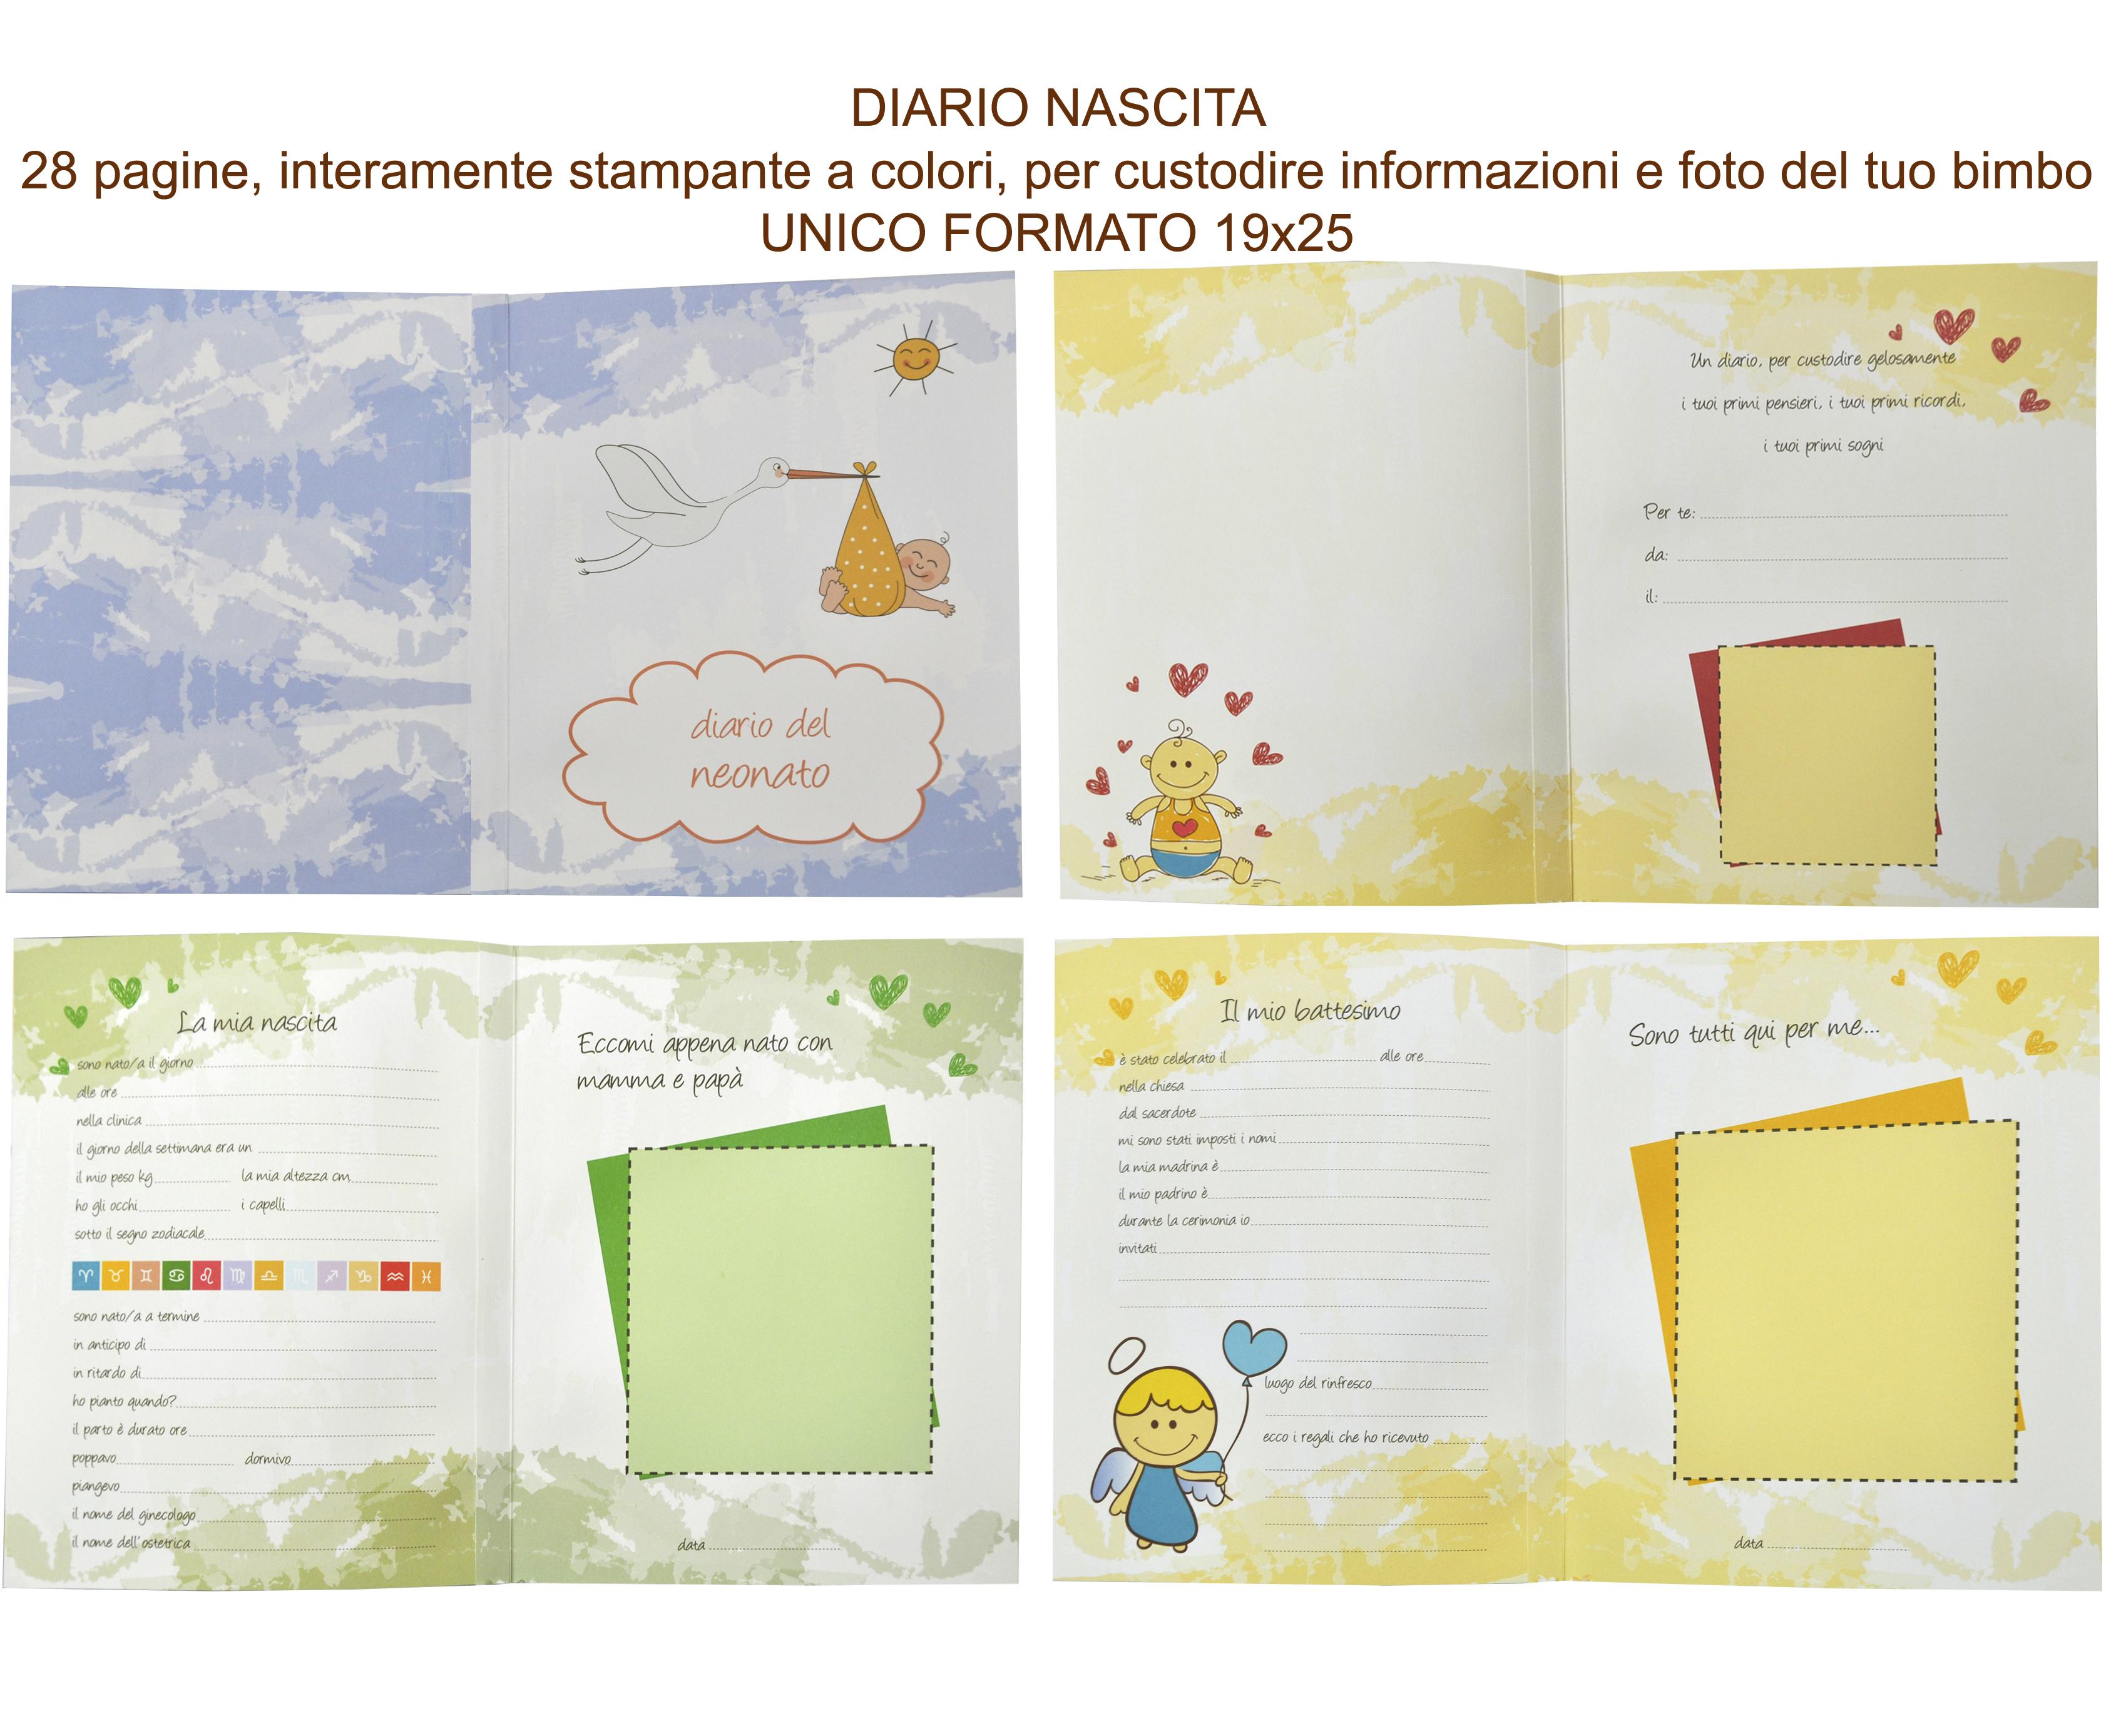 Fabula Diario Nascita